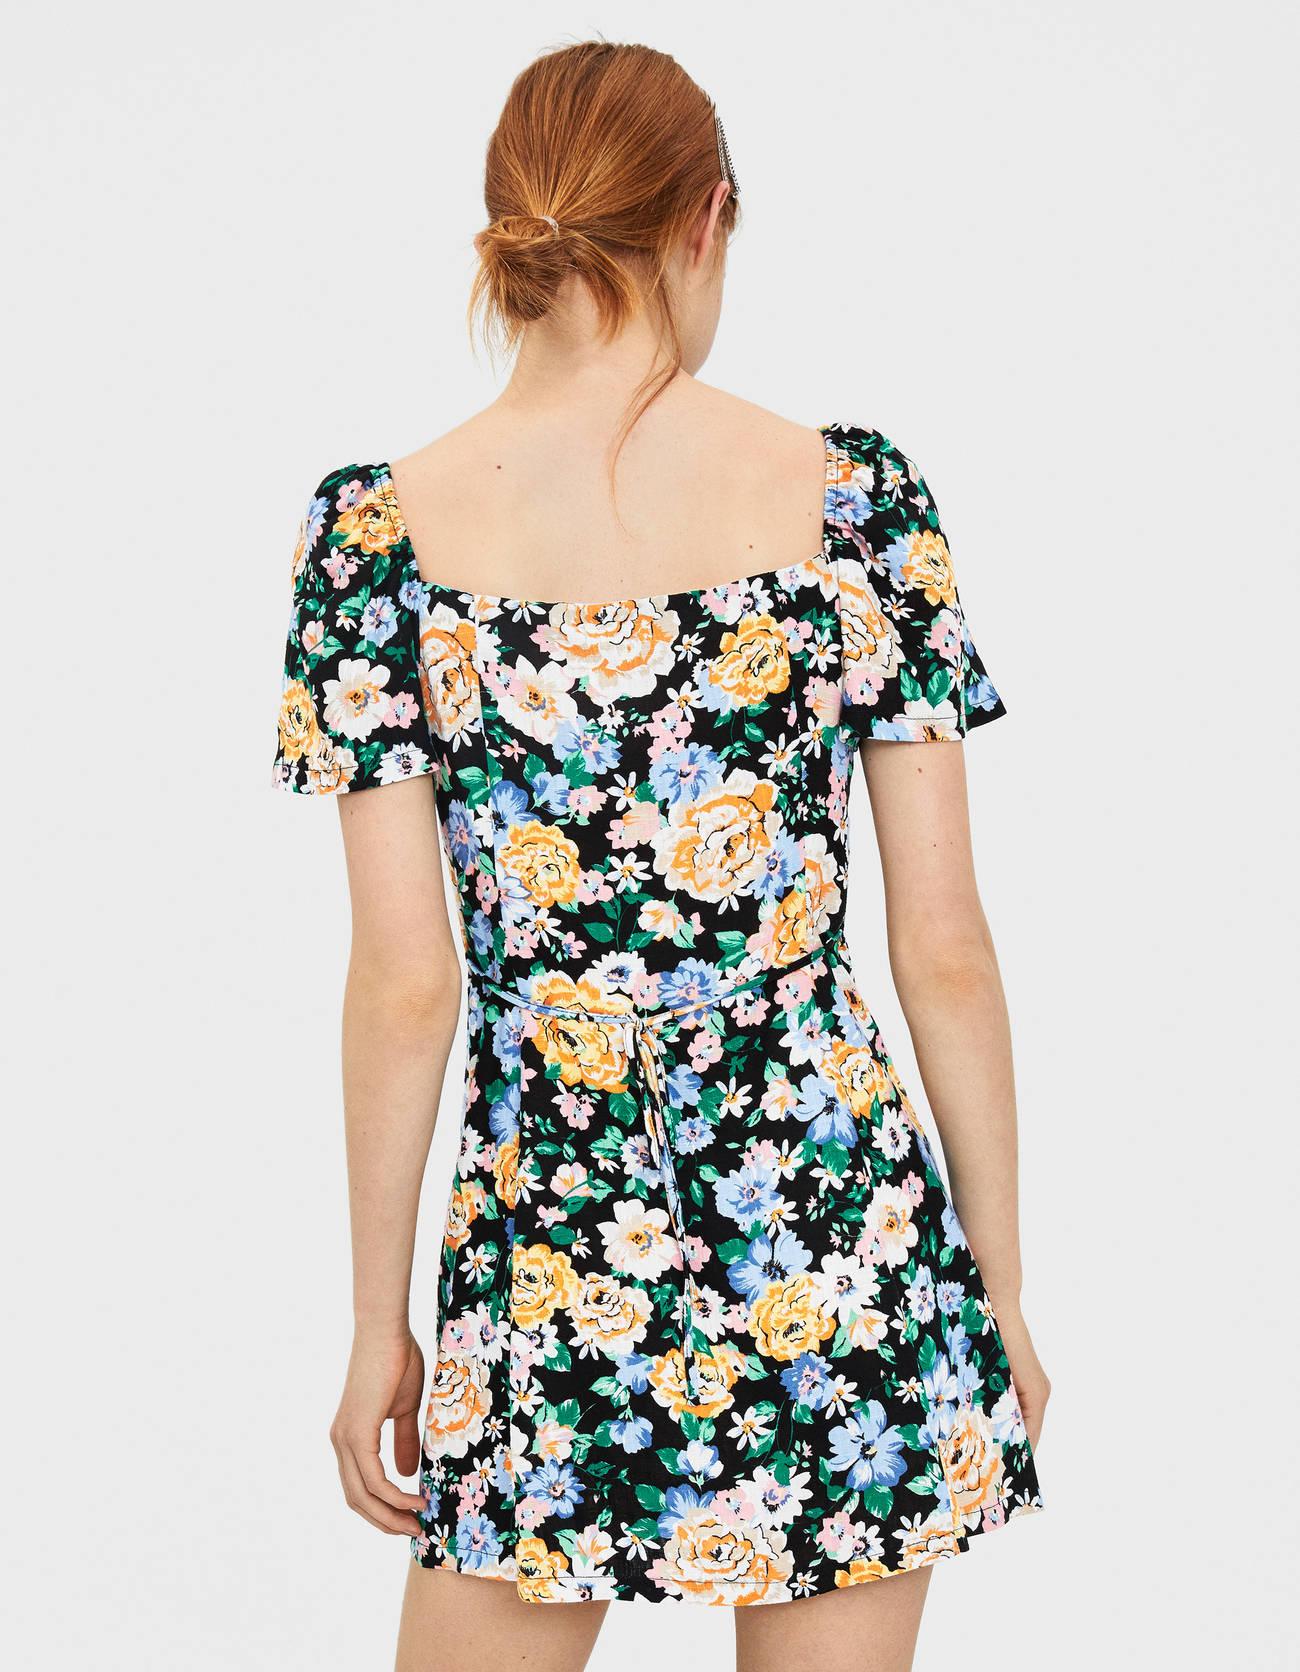 eab76cbdcbd0 Floral dress - Dresses - Bershka Tunisia